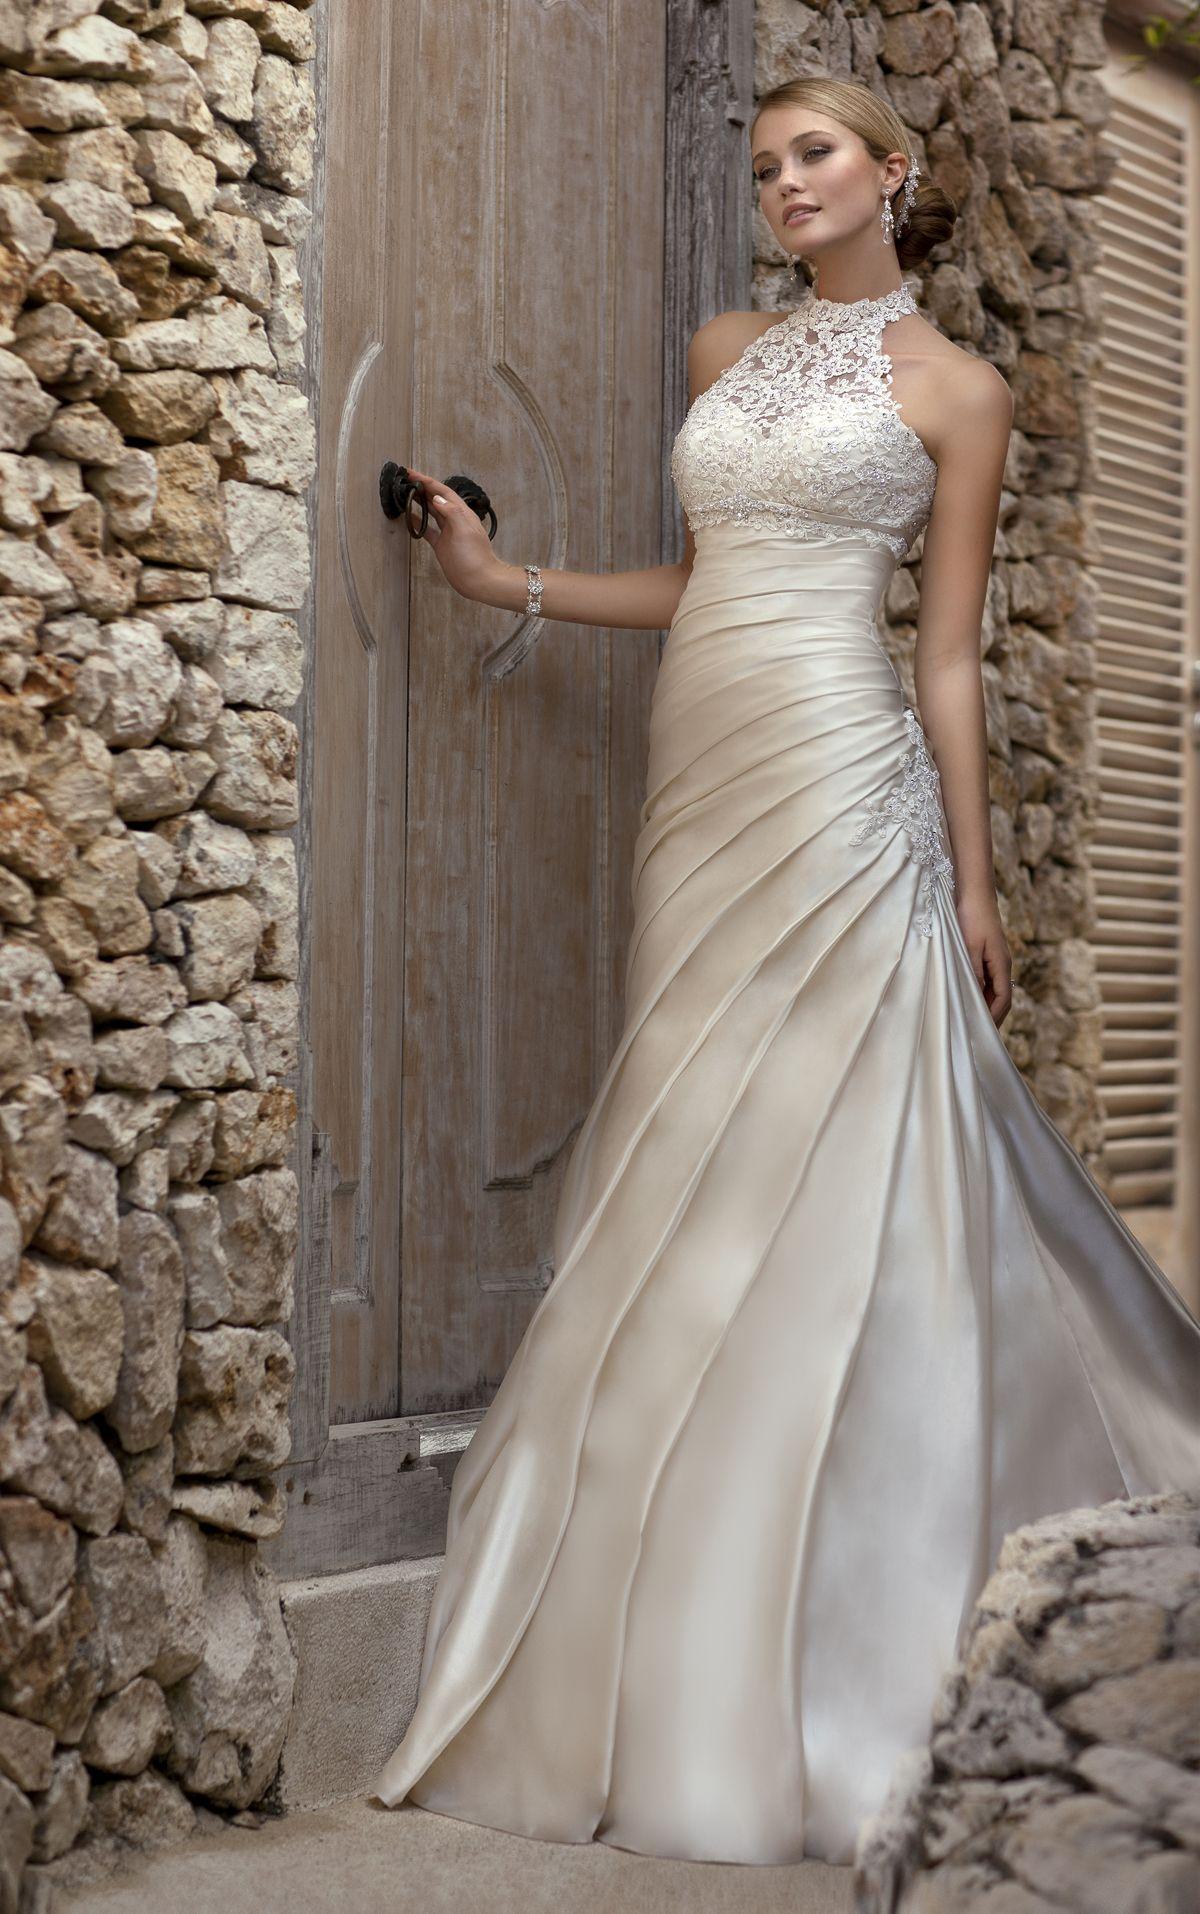 Slim fit wedding dresses  Designer Wedding Dresses  Stella york Wedding dress and Weddings